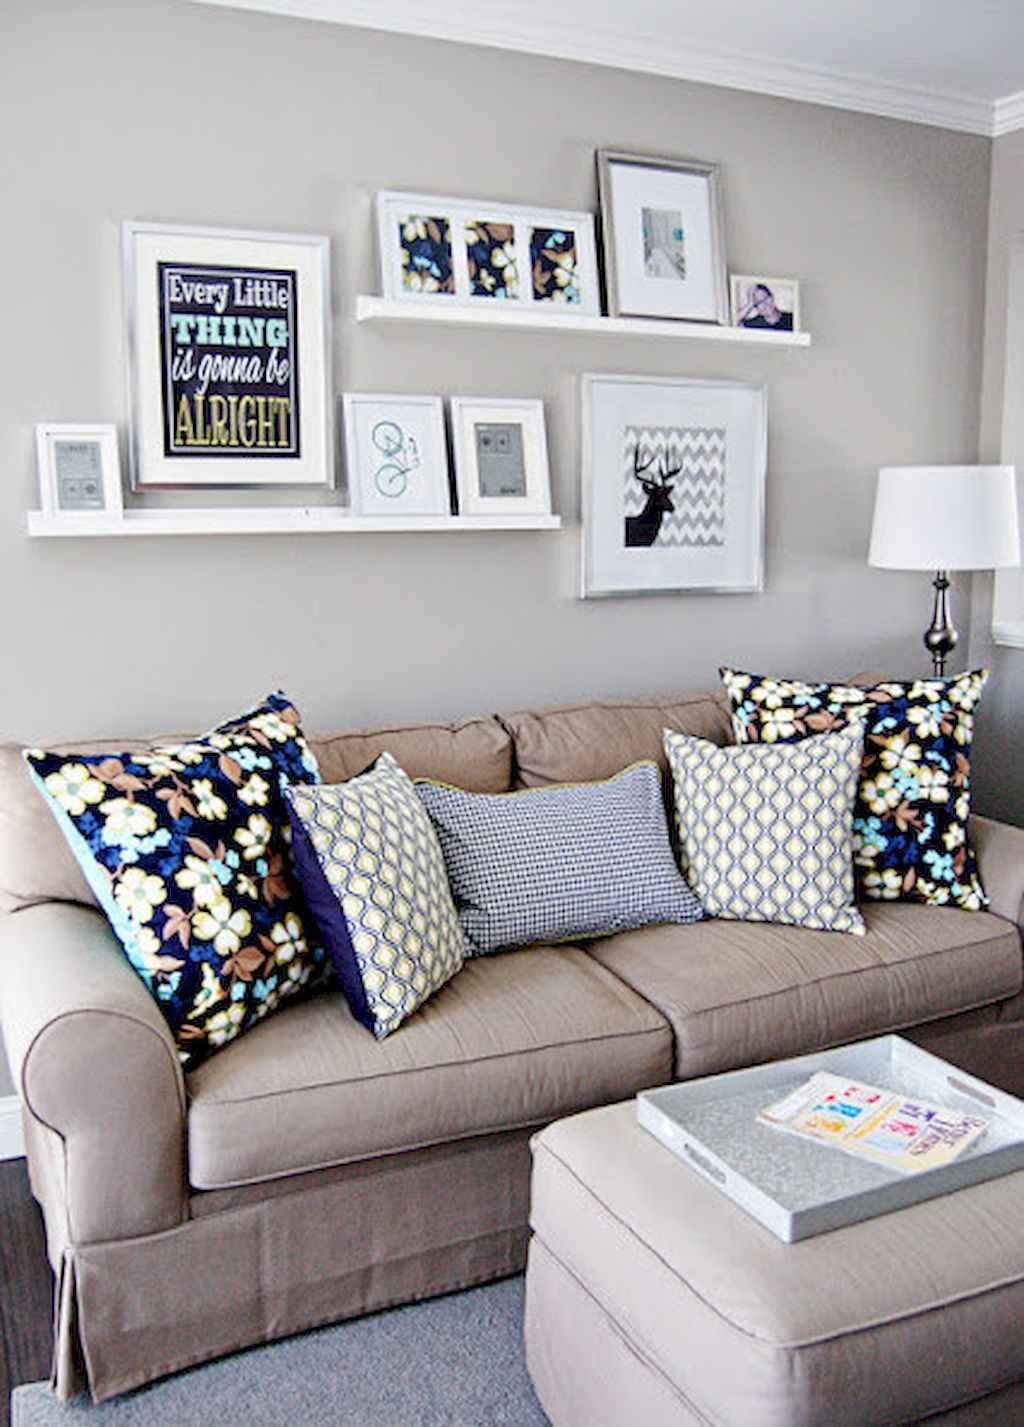 Small apartment decorating ideas (3)